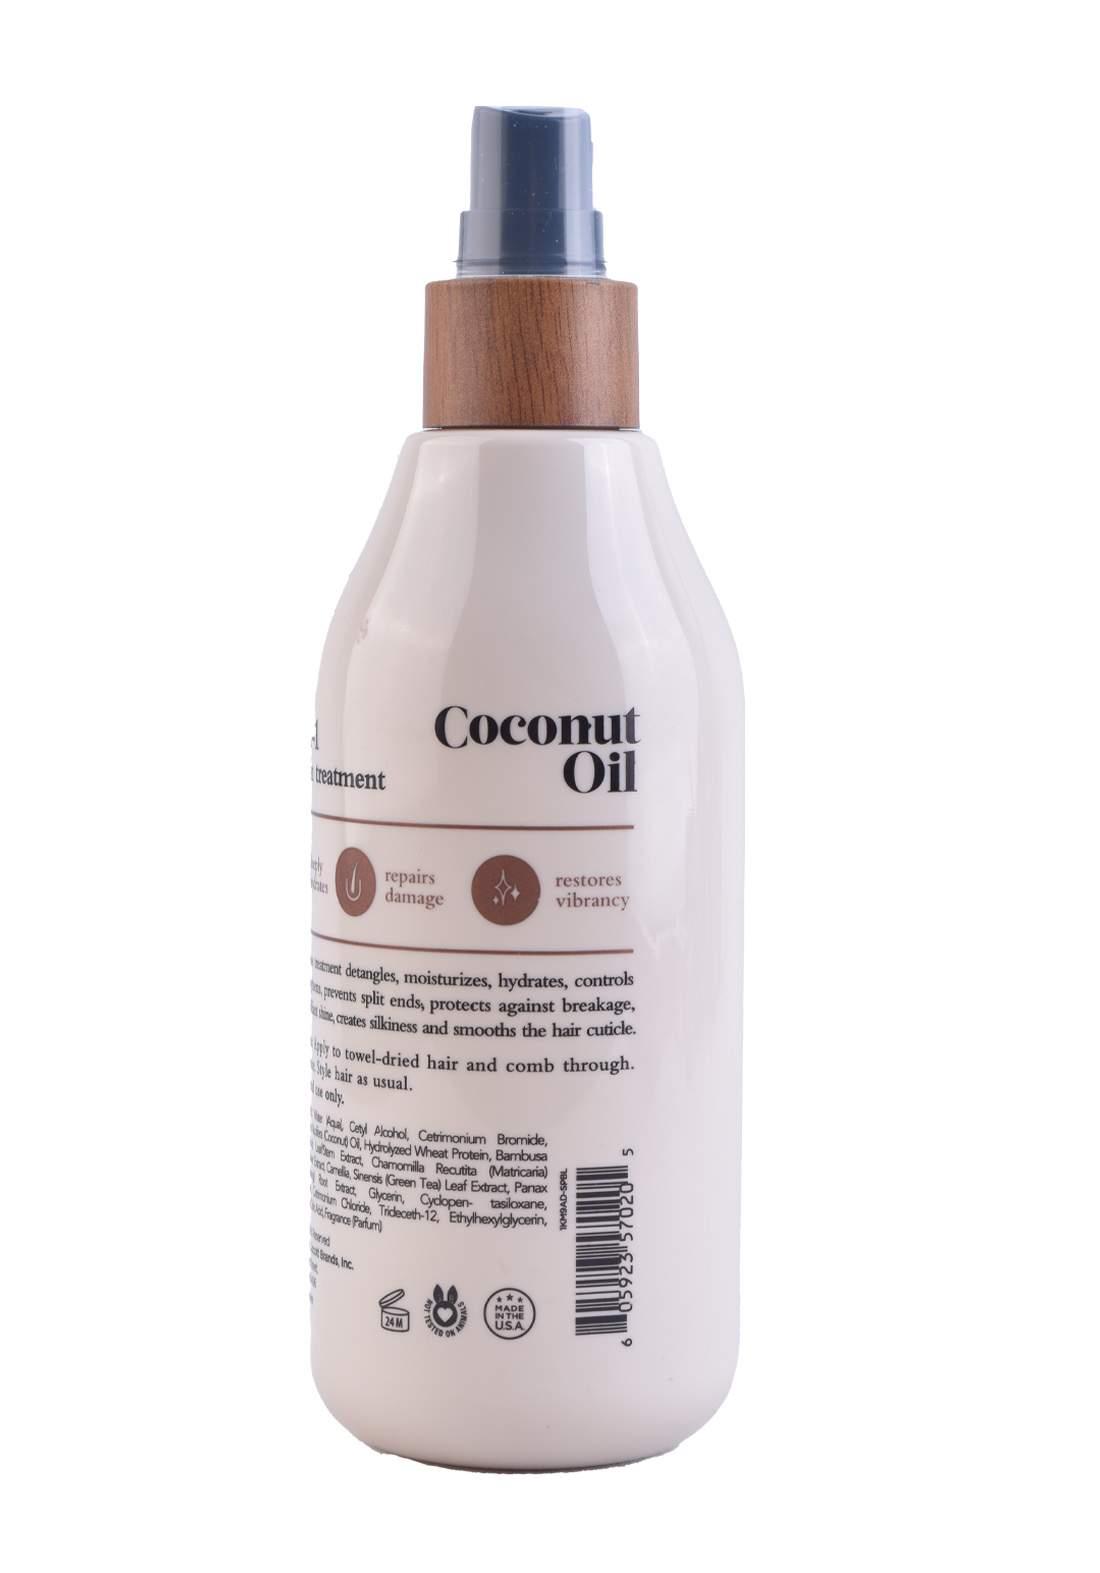 Oliology Coconut Oil 10-in-1 Multipurpose Spray 250 ml بخاخ مقوي للشعر